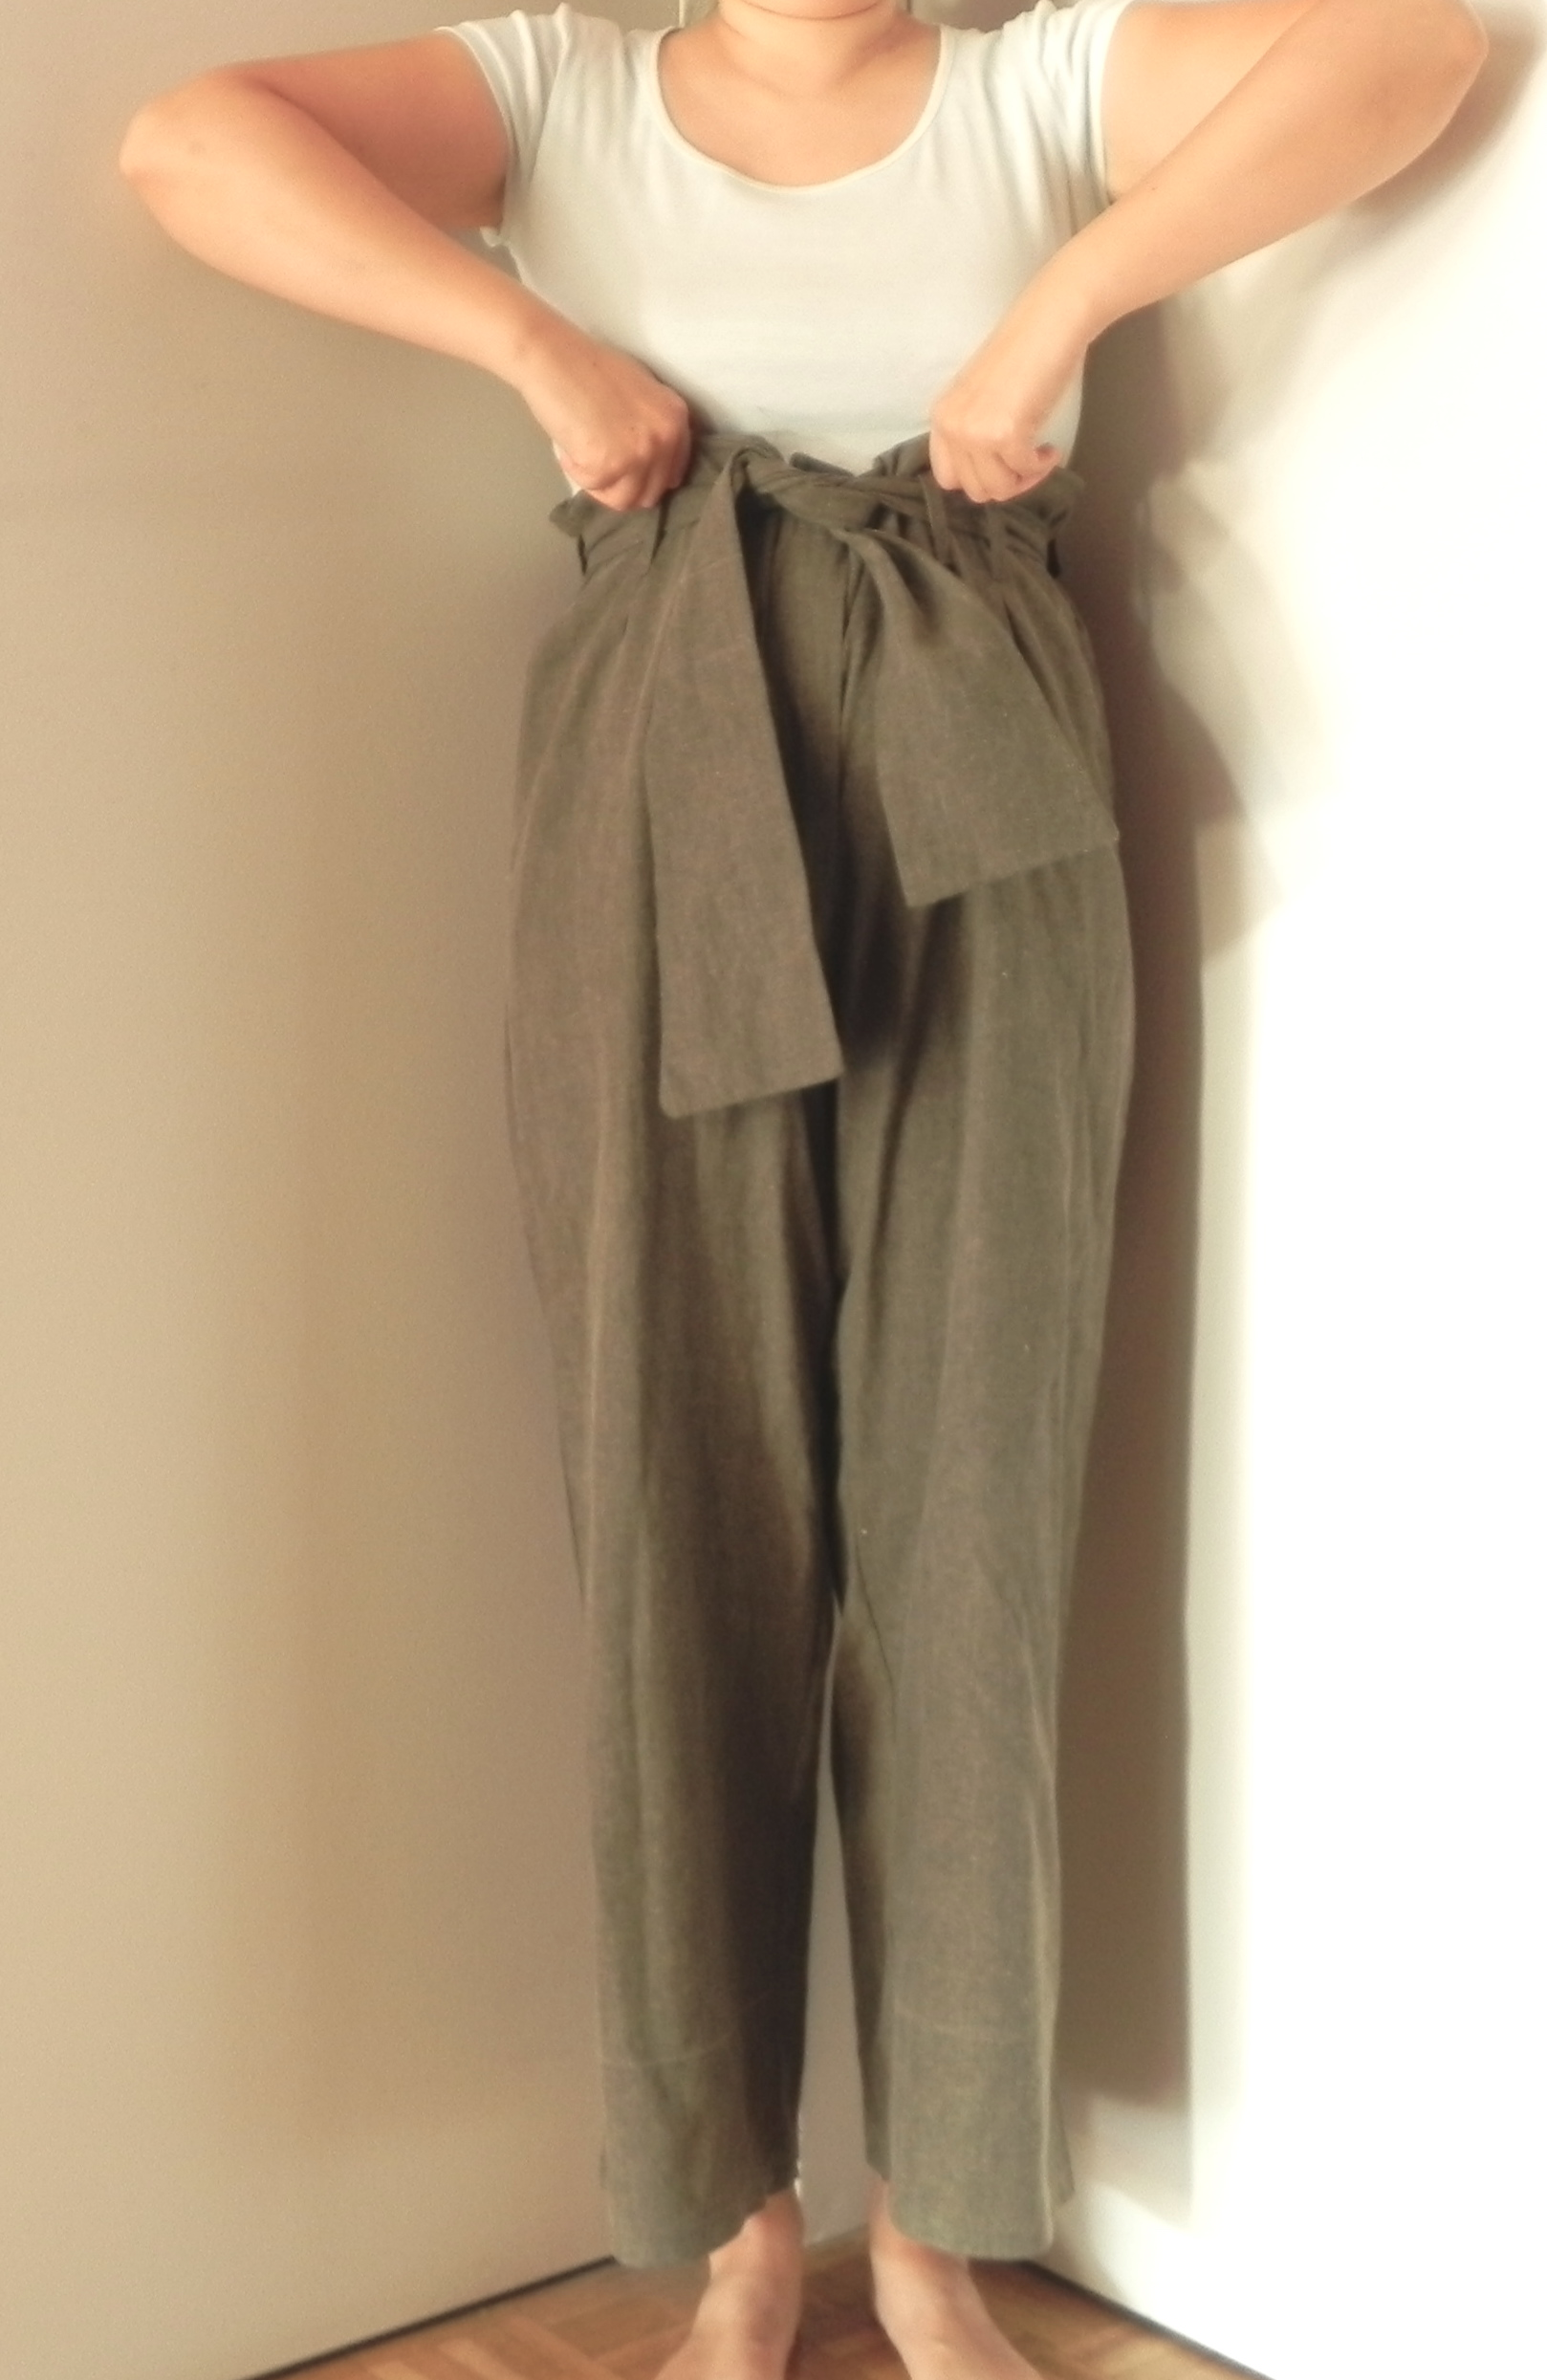 Pantalon lin kaki ceinture remontée